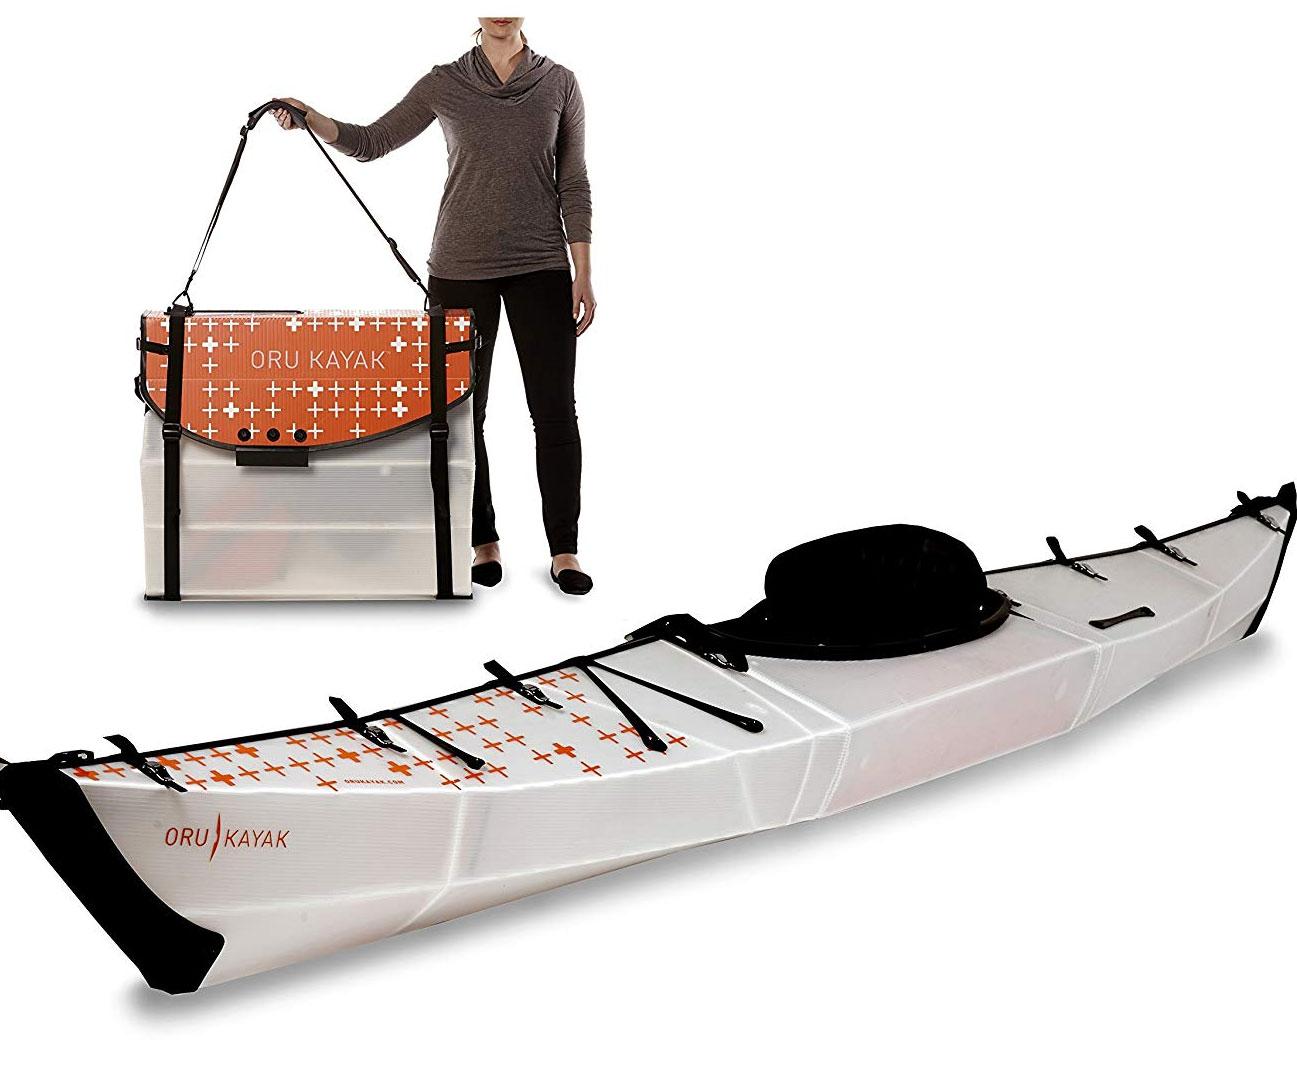 The Collapsible Kayak